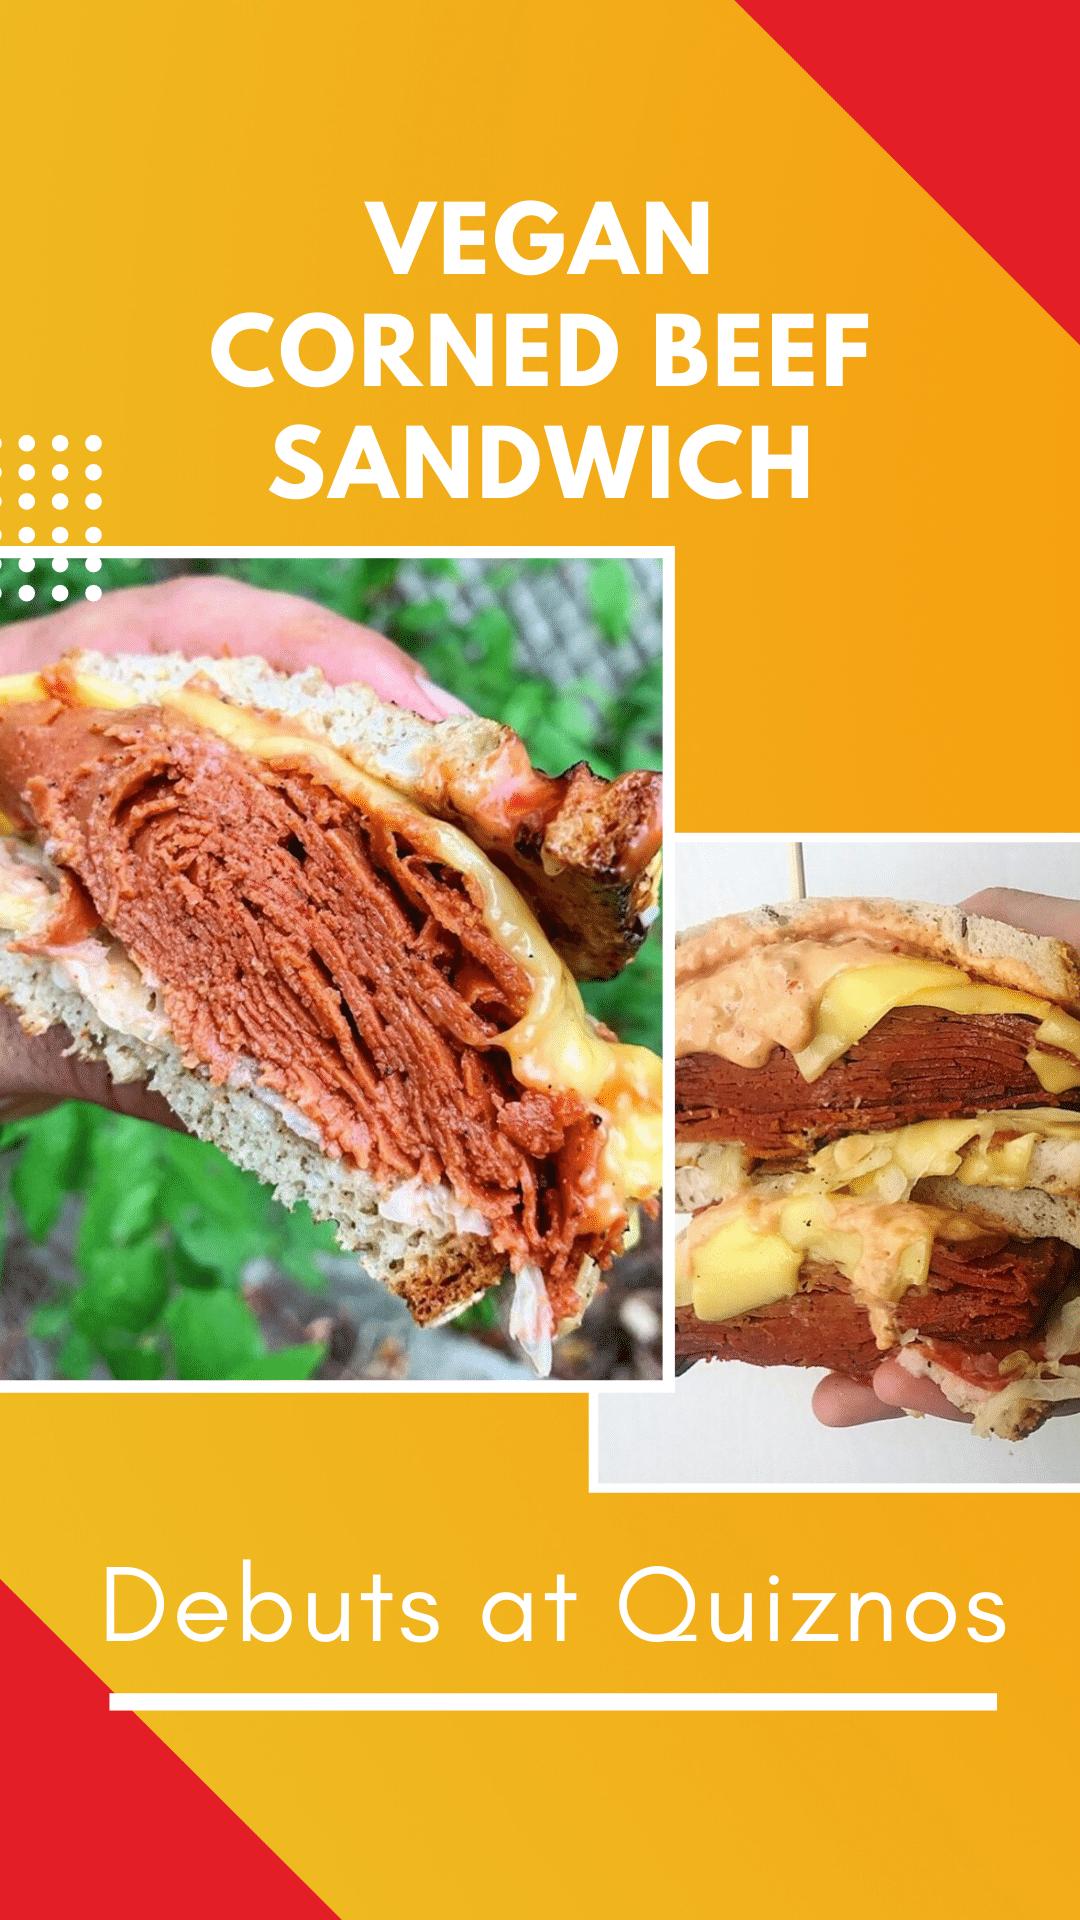 Vegan Corned Beef Sandwich Debuts at Quiznos in Denver